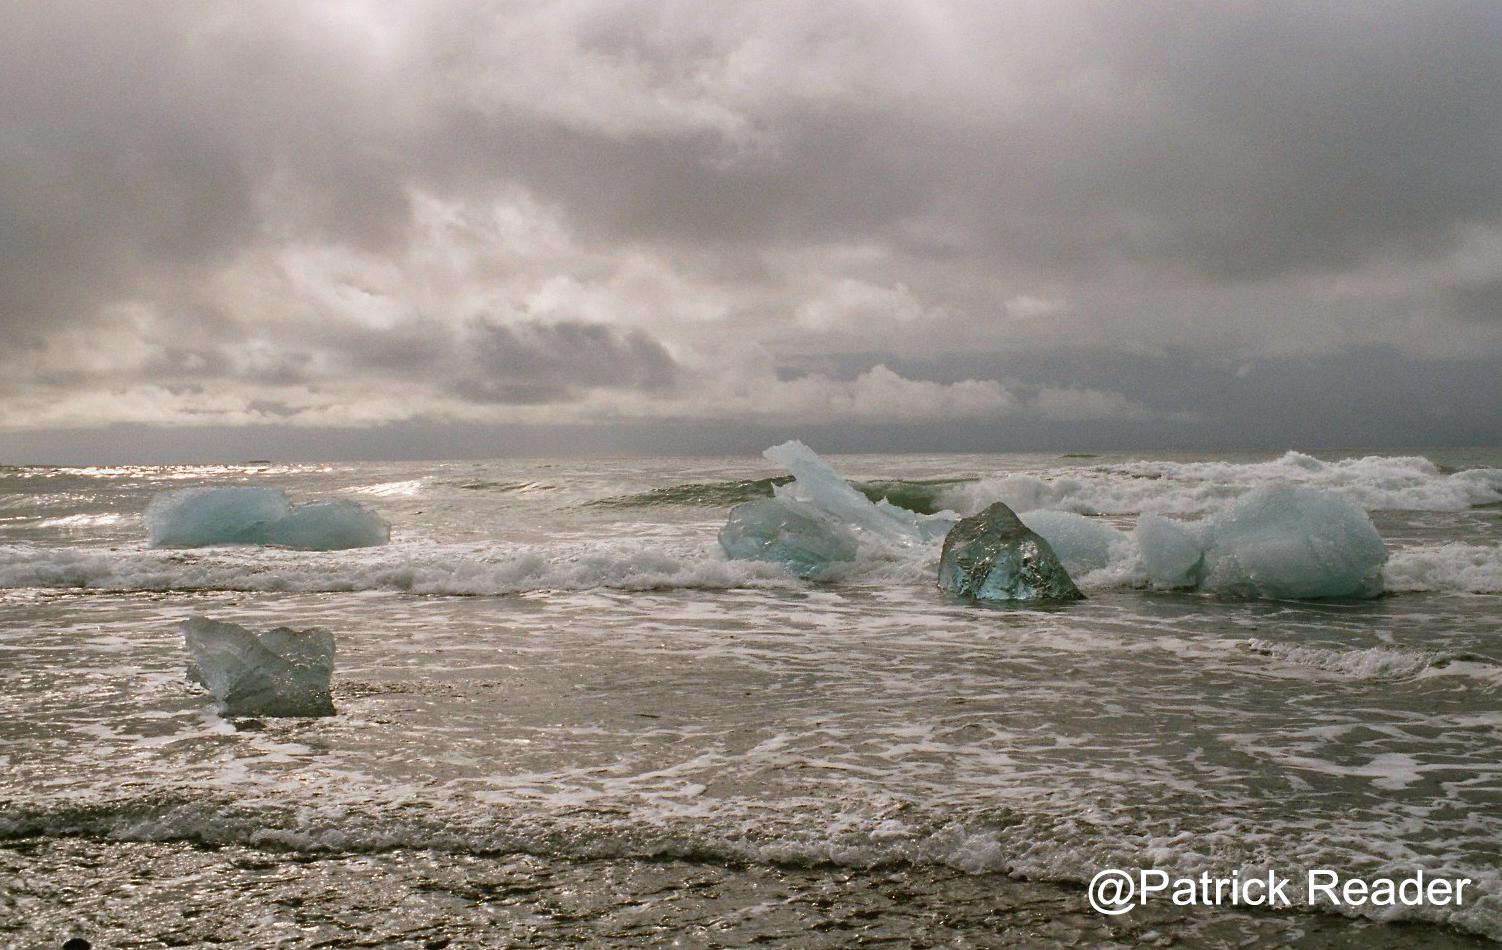 Gothic Icelandic sea!